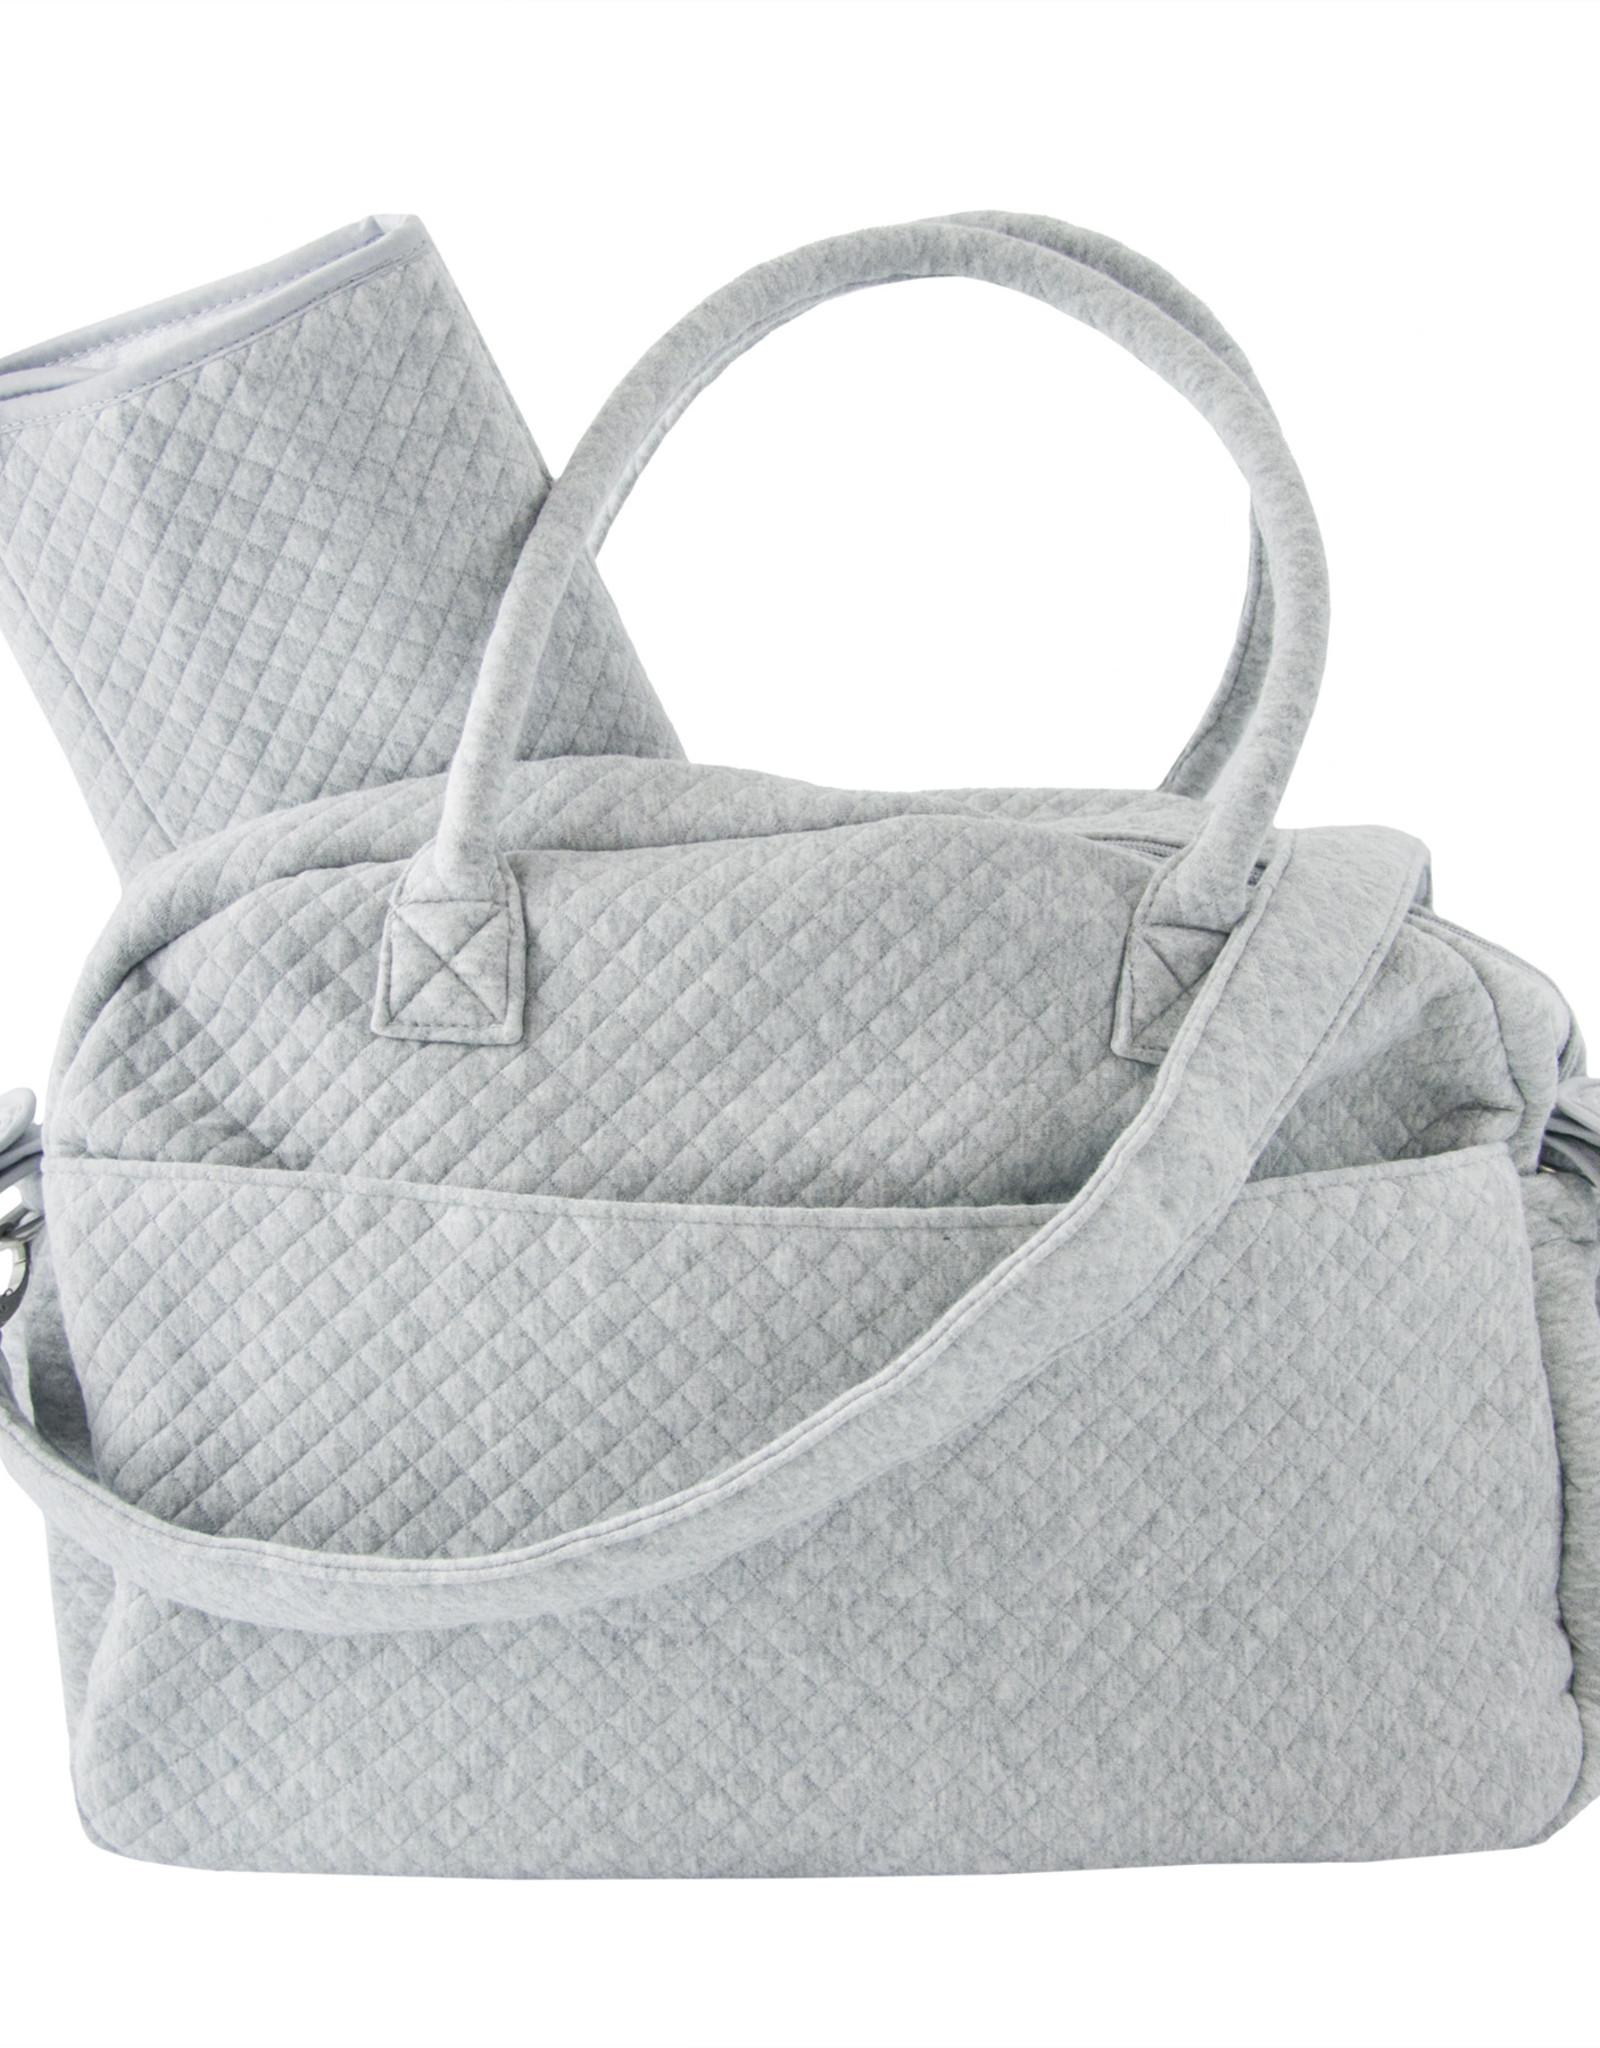 Les Rêves d'Anaïs  Diaper Bag - Mineral Grey